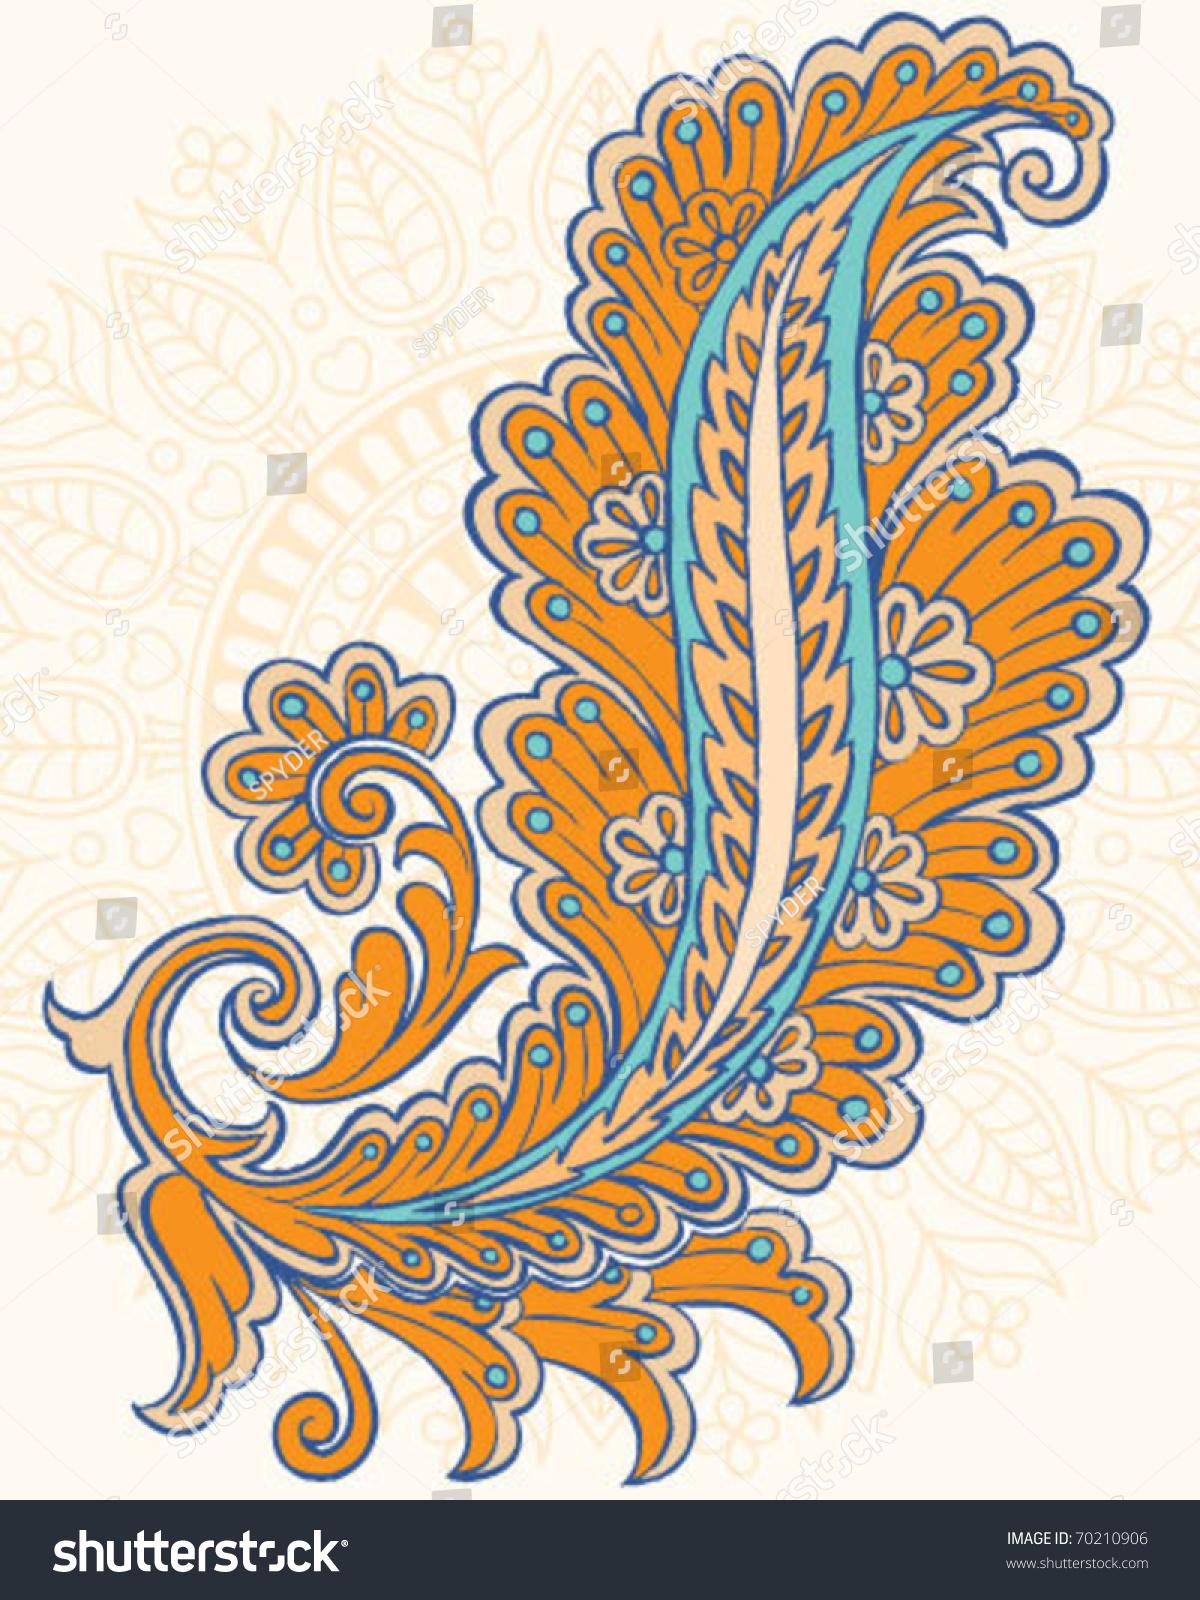 Hand Drawn Vector Paisley Design Stock Vector 70210906 - Shutterstock